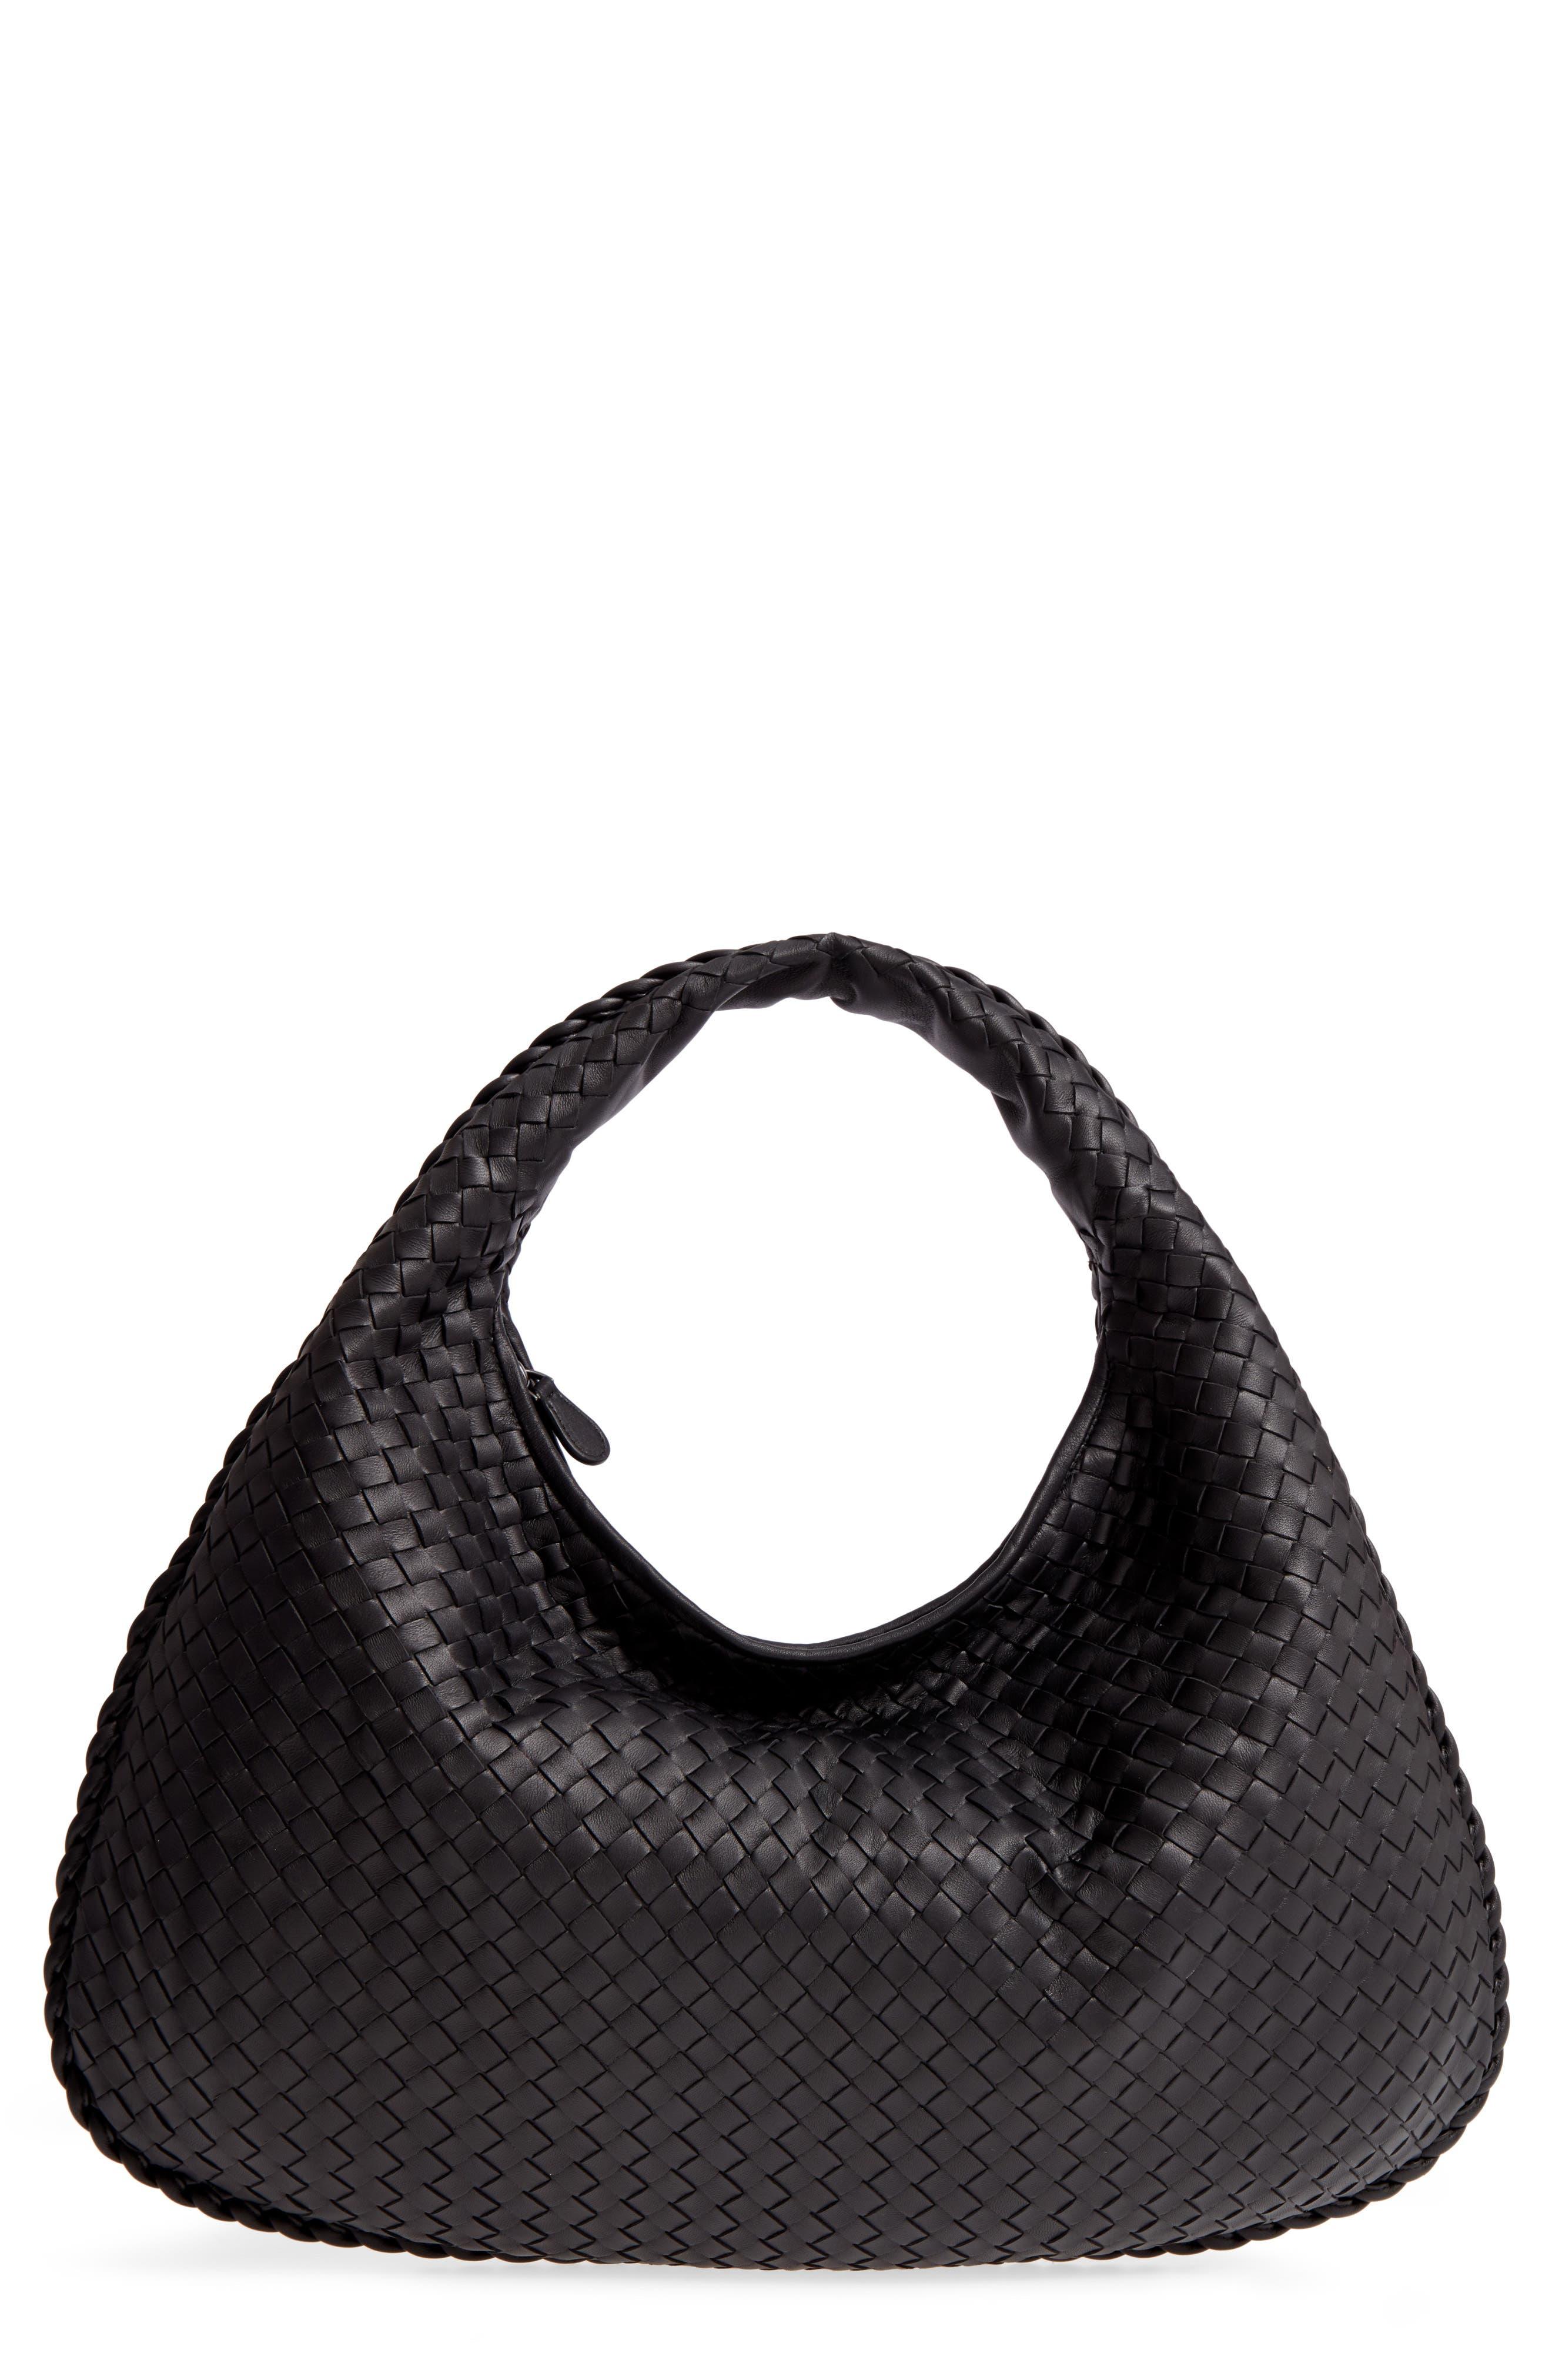 Large Veneta Leather Hobo,                             Main thumbnail 1, color,                             8175 NERO